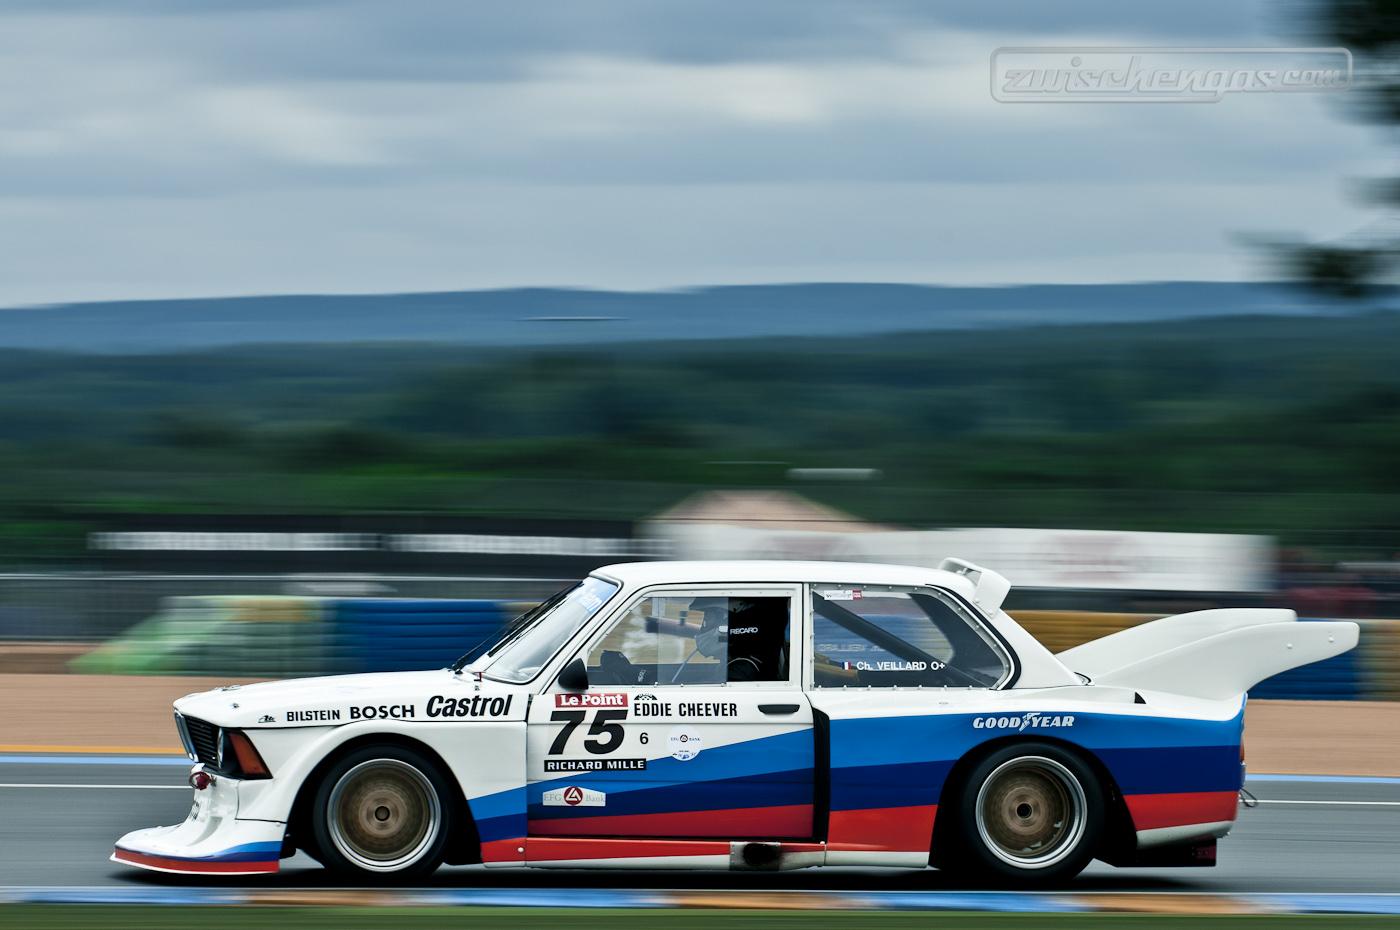 BMW E21 320i Gruppe 5 @ Le Mans Classic 2012 (f11, 1/80sec)